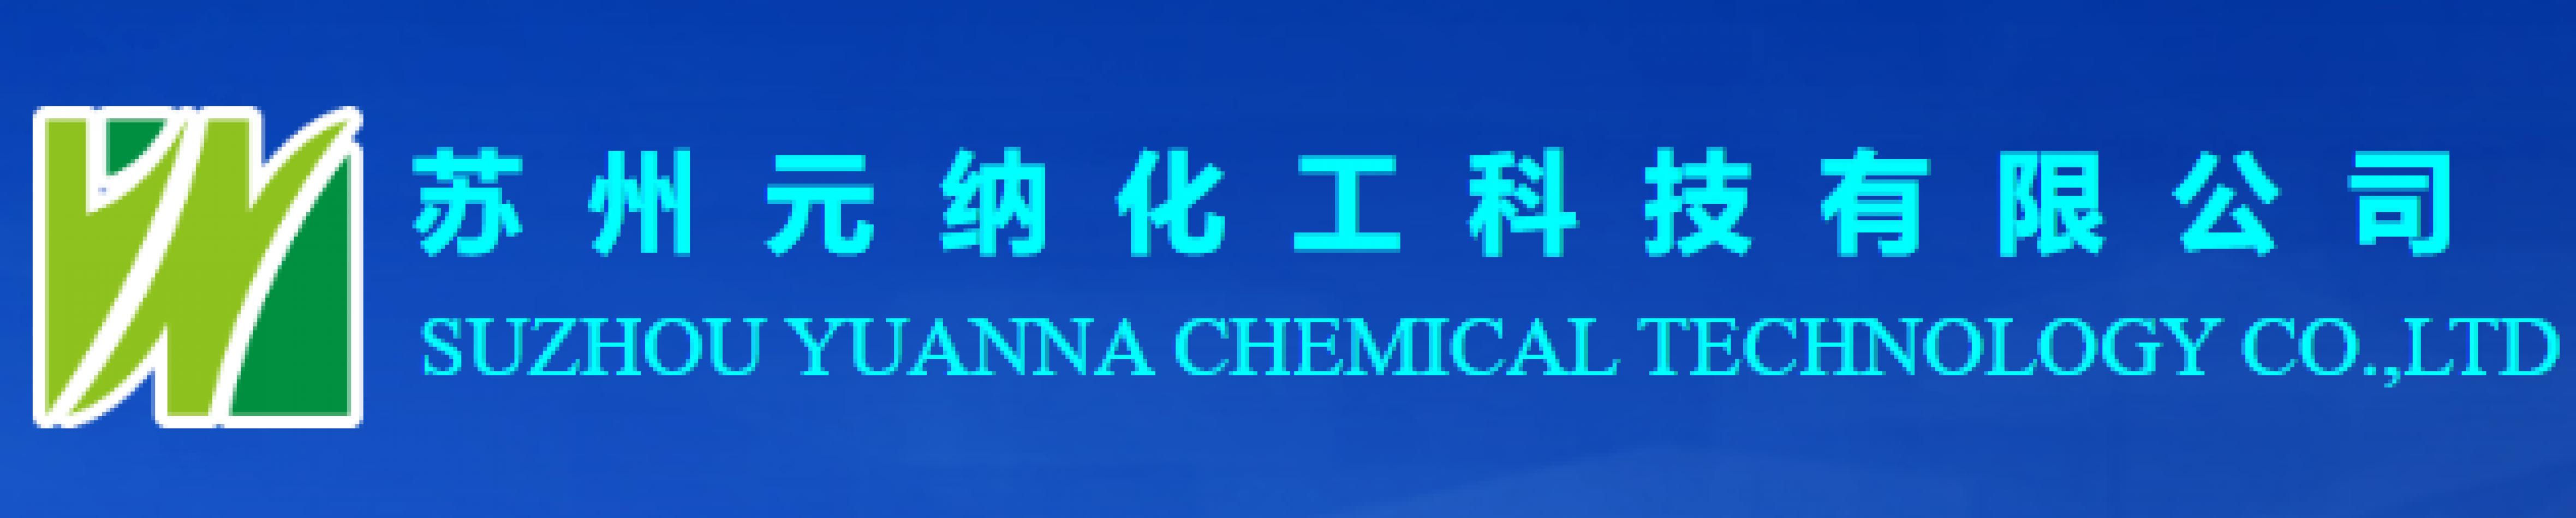 SUZHOU YUANNA CHEMICAL TECHNOLOGY CO., LTD.